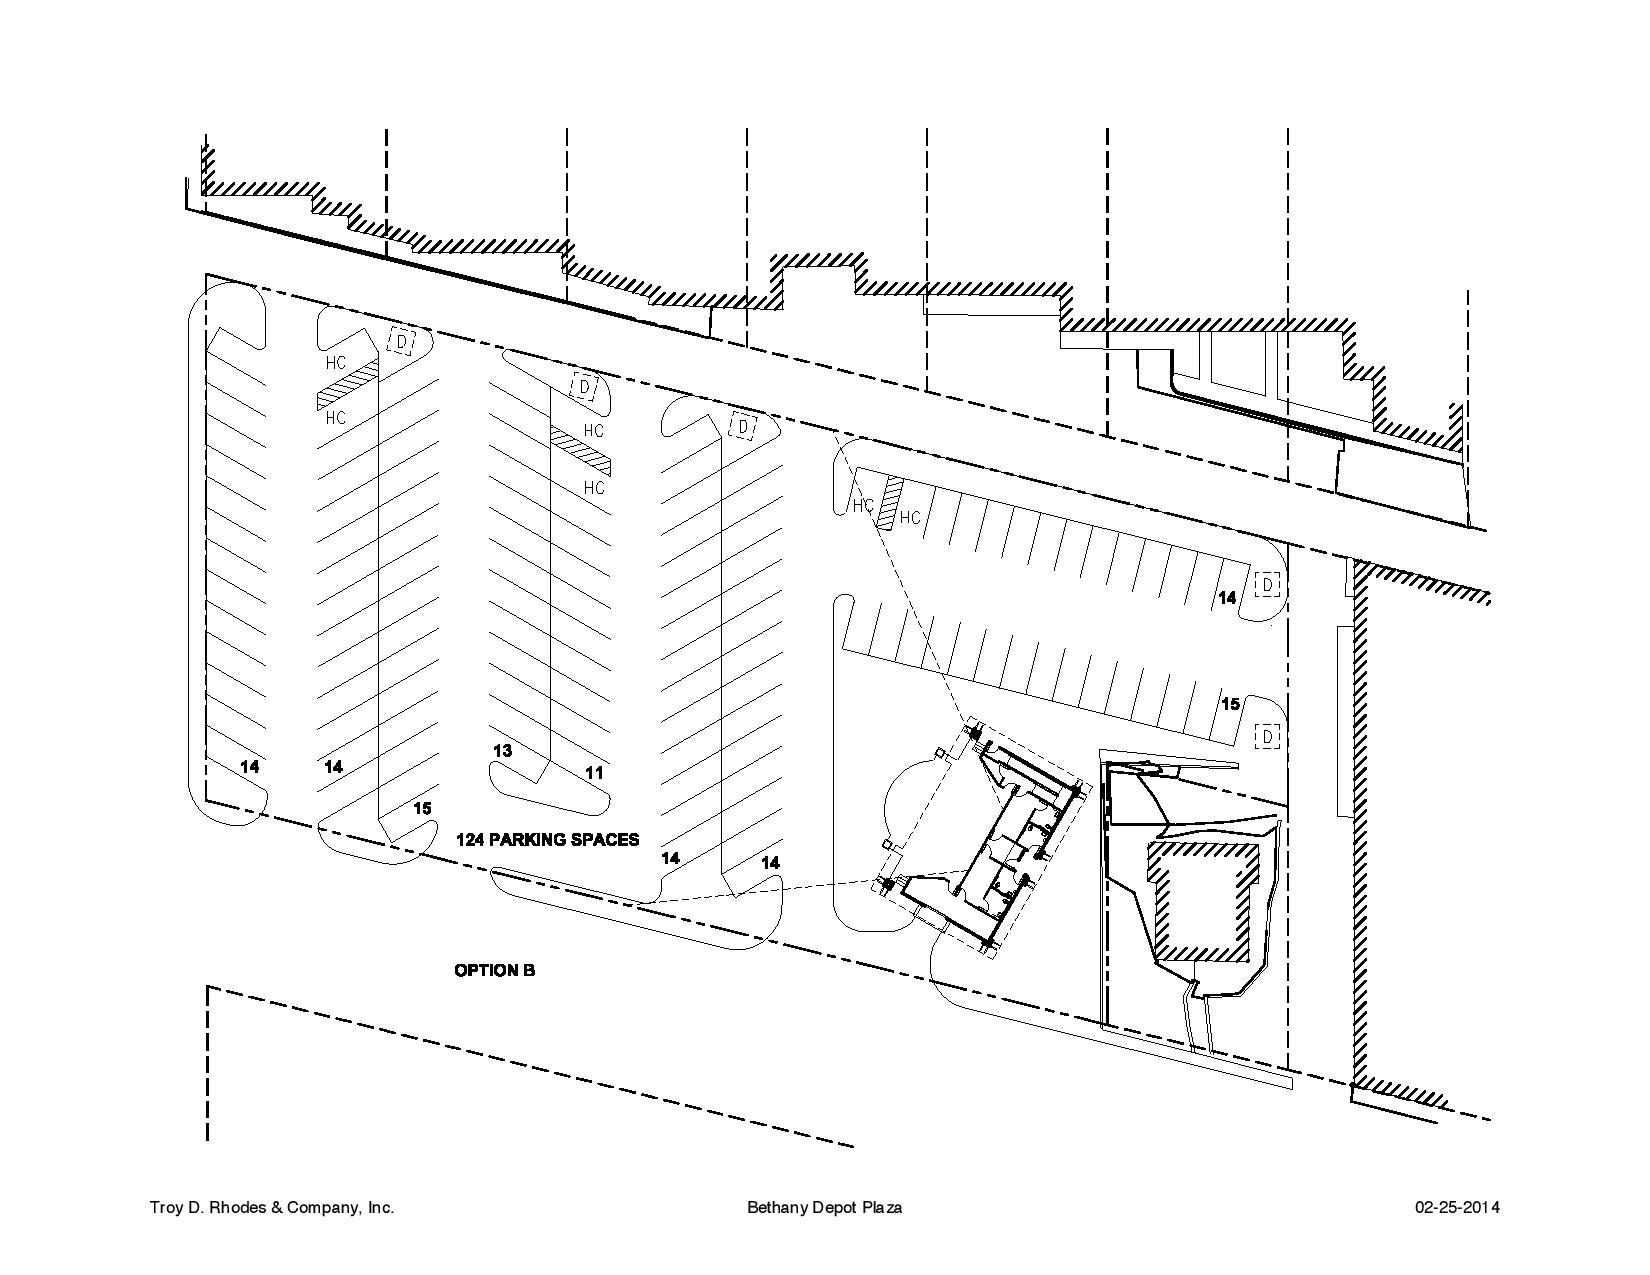 Bethany Depot Plaza Final 2-25-14-page-004.jpg